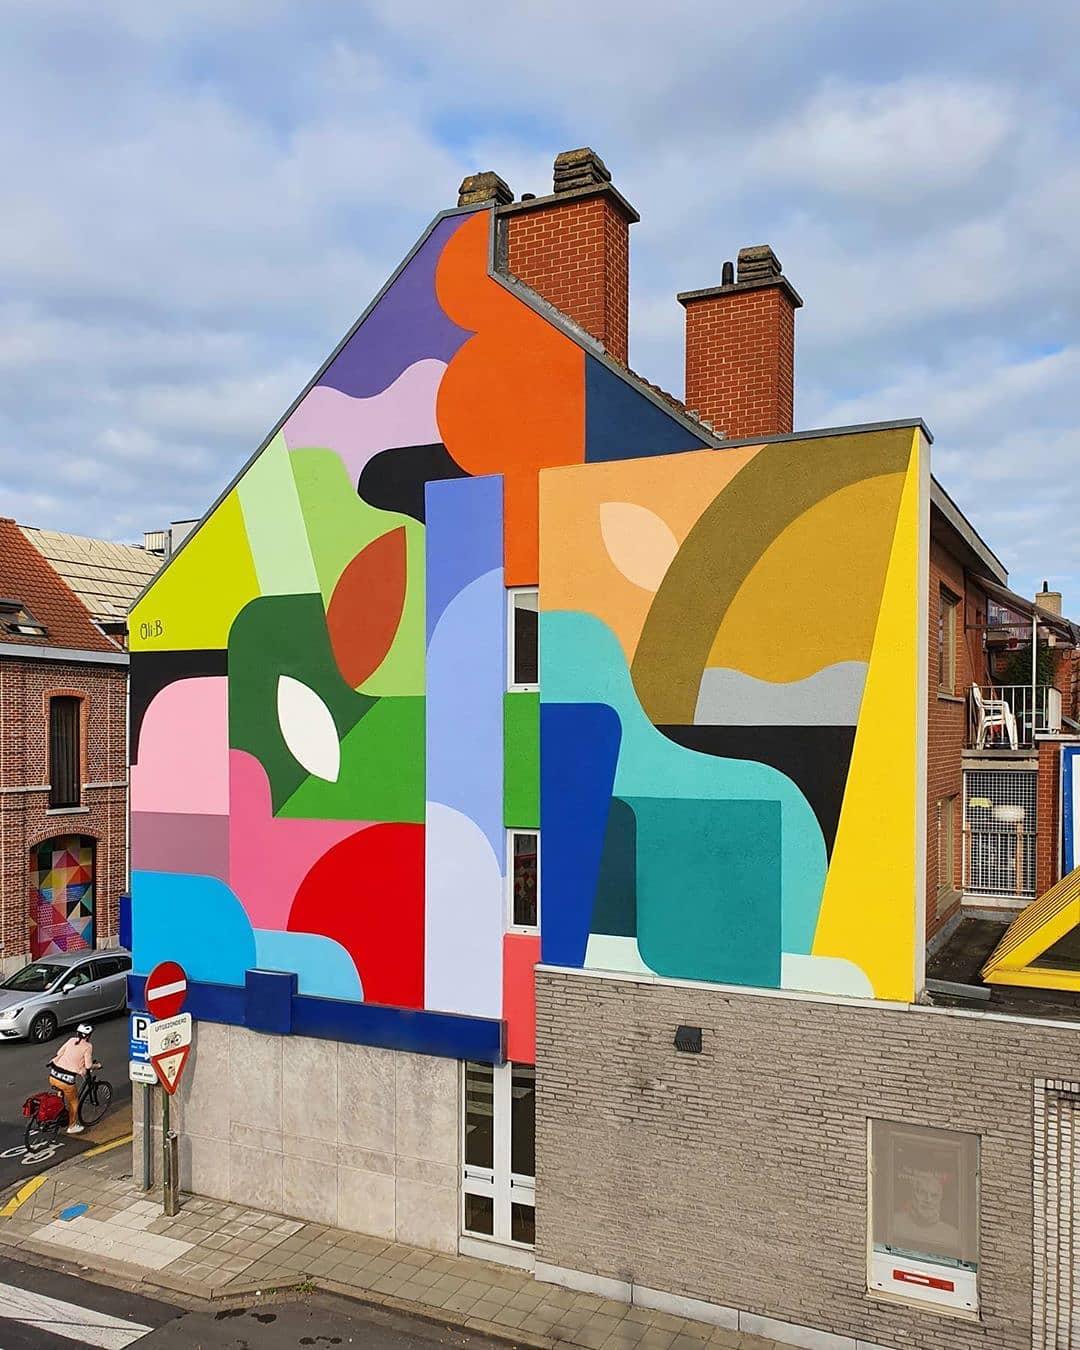 Oli-B @ Wevelgem, Belgium